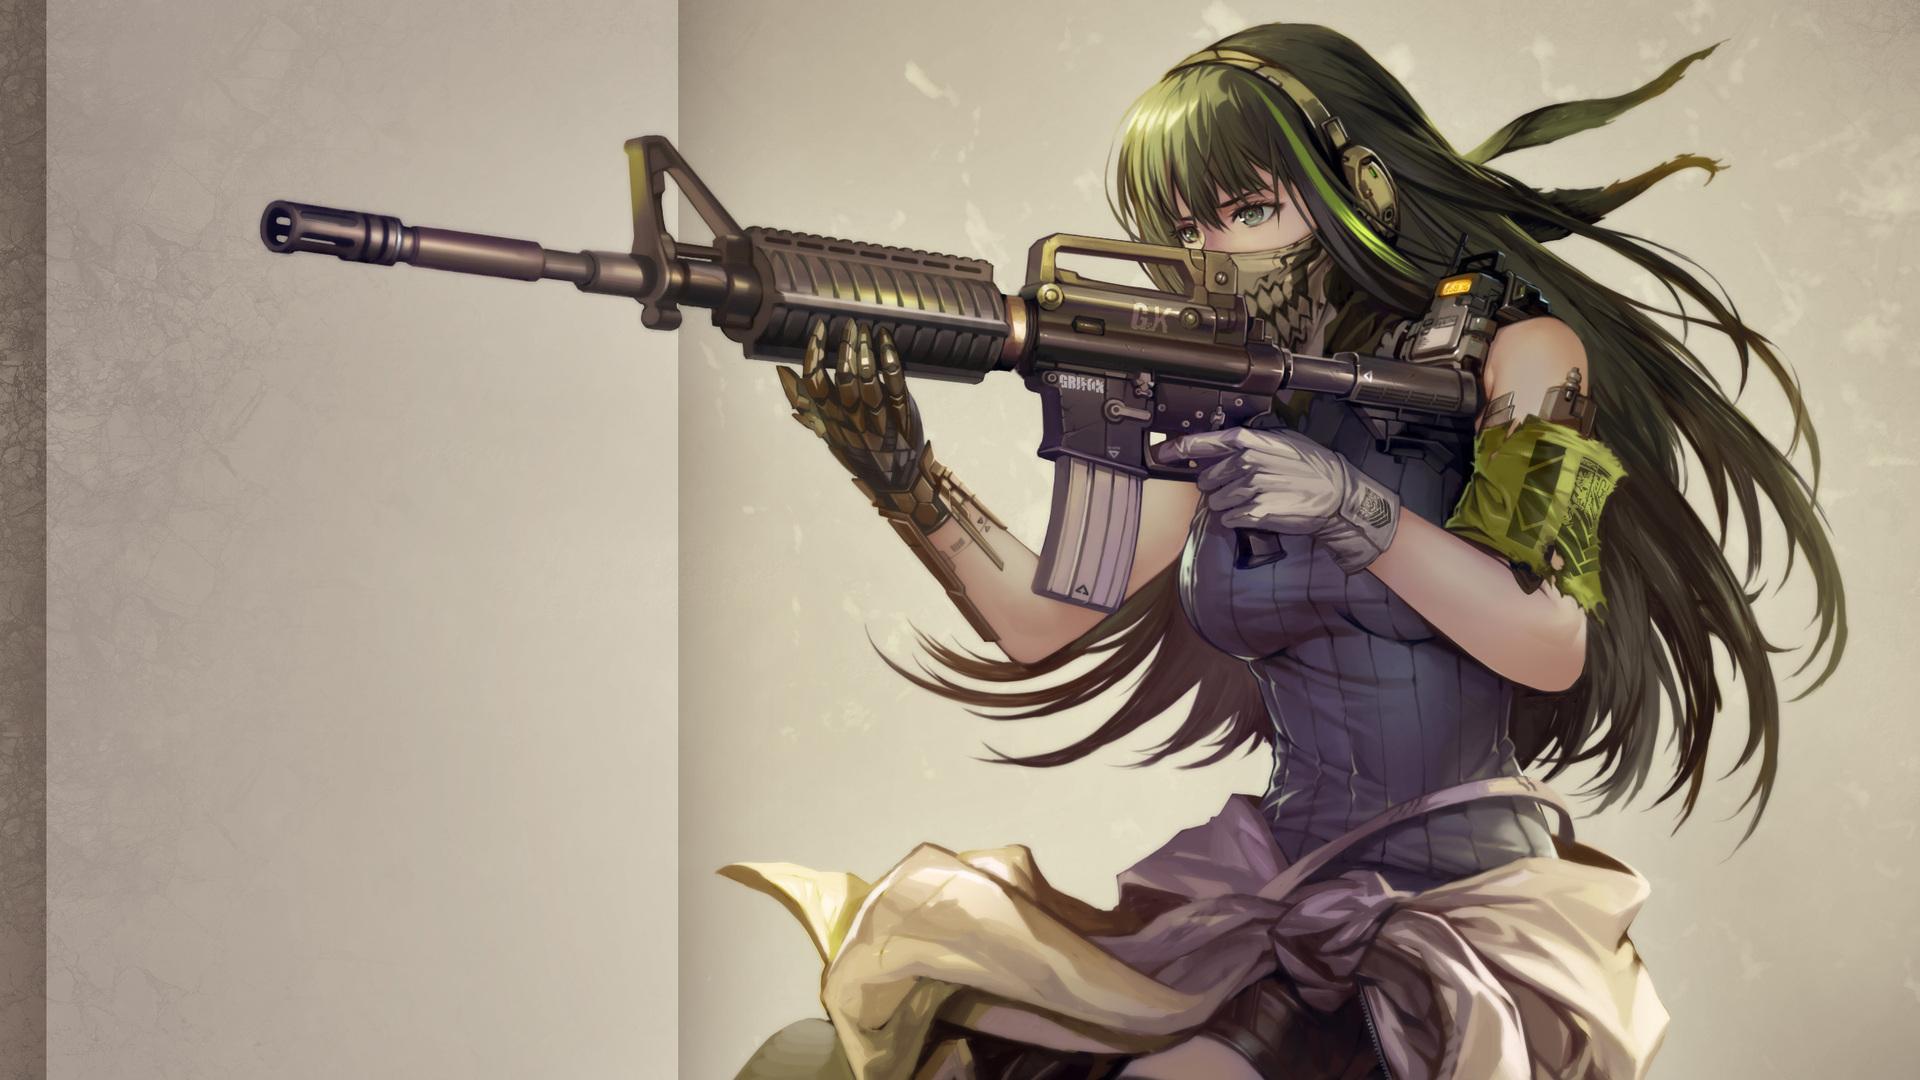 Cute Chibi Anime Desktop Wallpaper 1920x1080 Girls Frontline Anime Laptop Full Hd 1080p Hd 4k